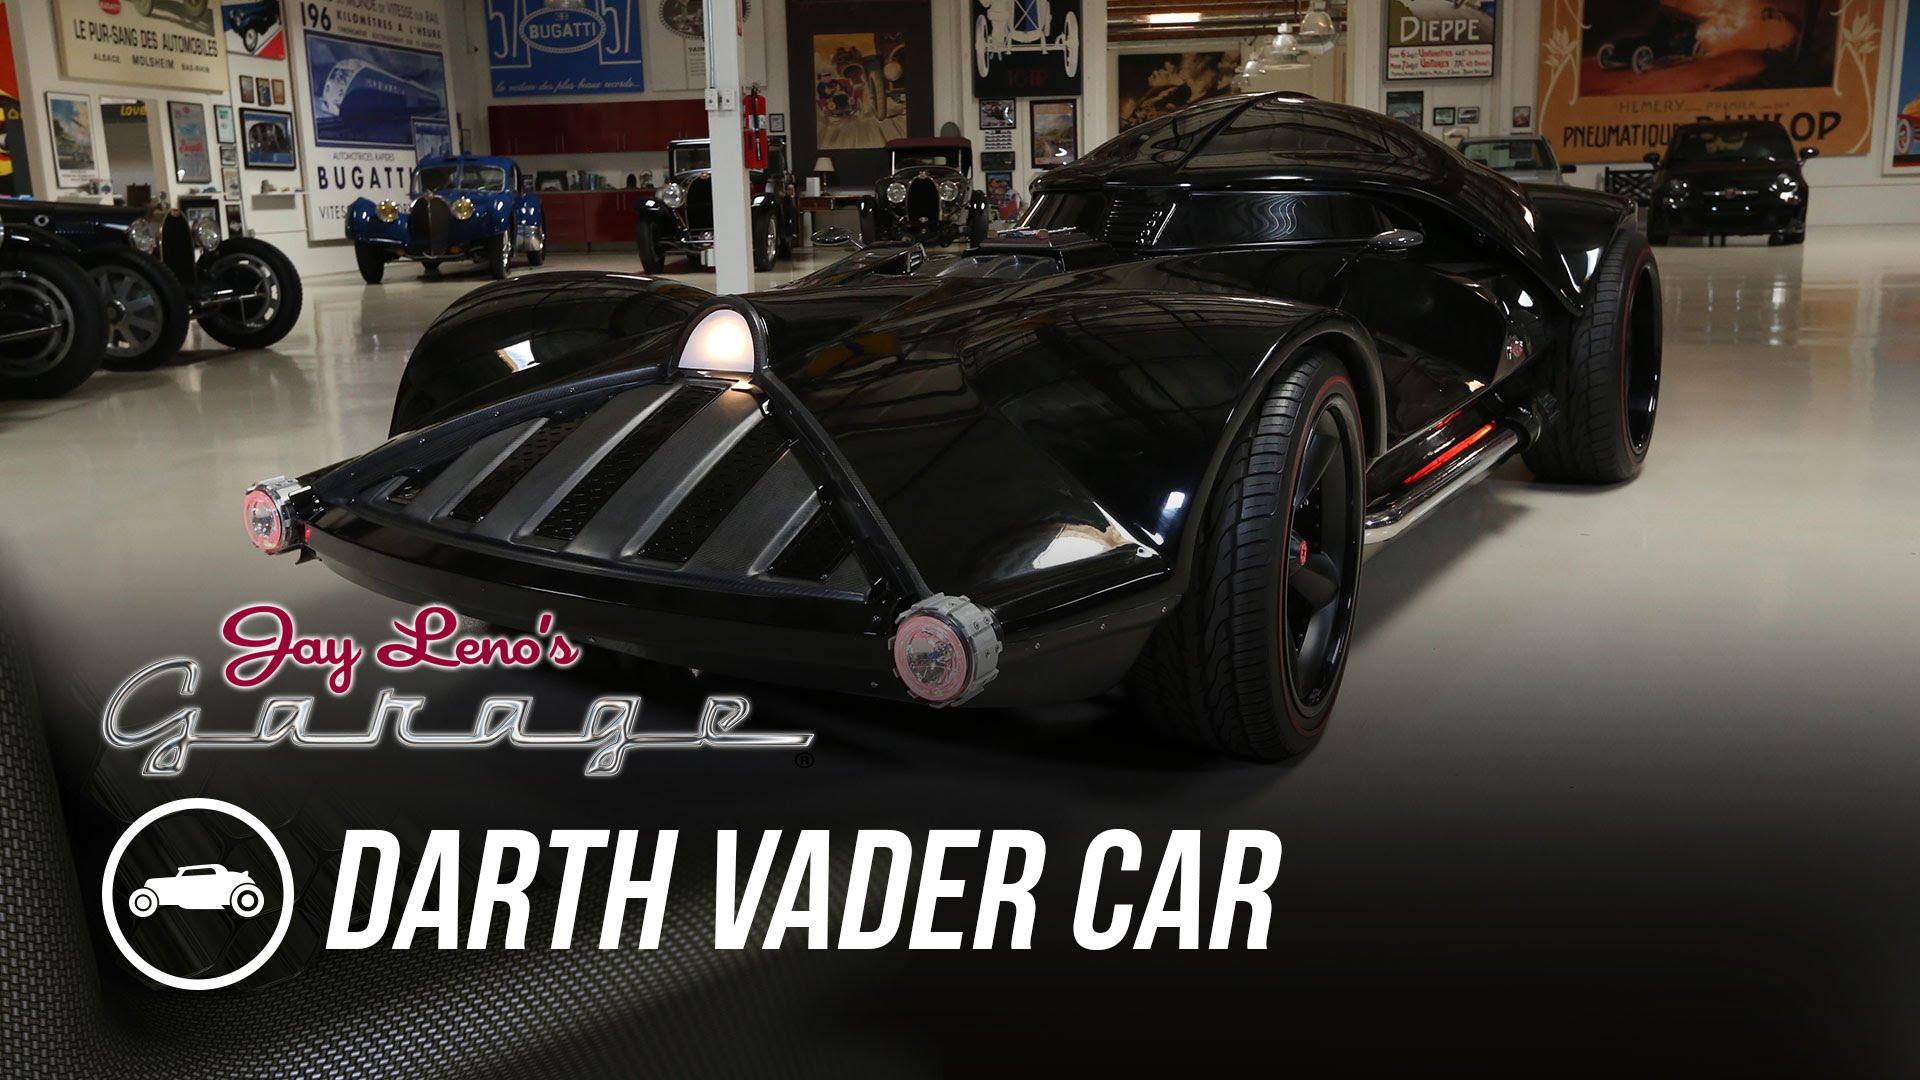 jay leno's garage - hot wheels' star wars darth vader car | auto